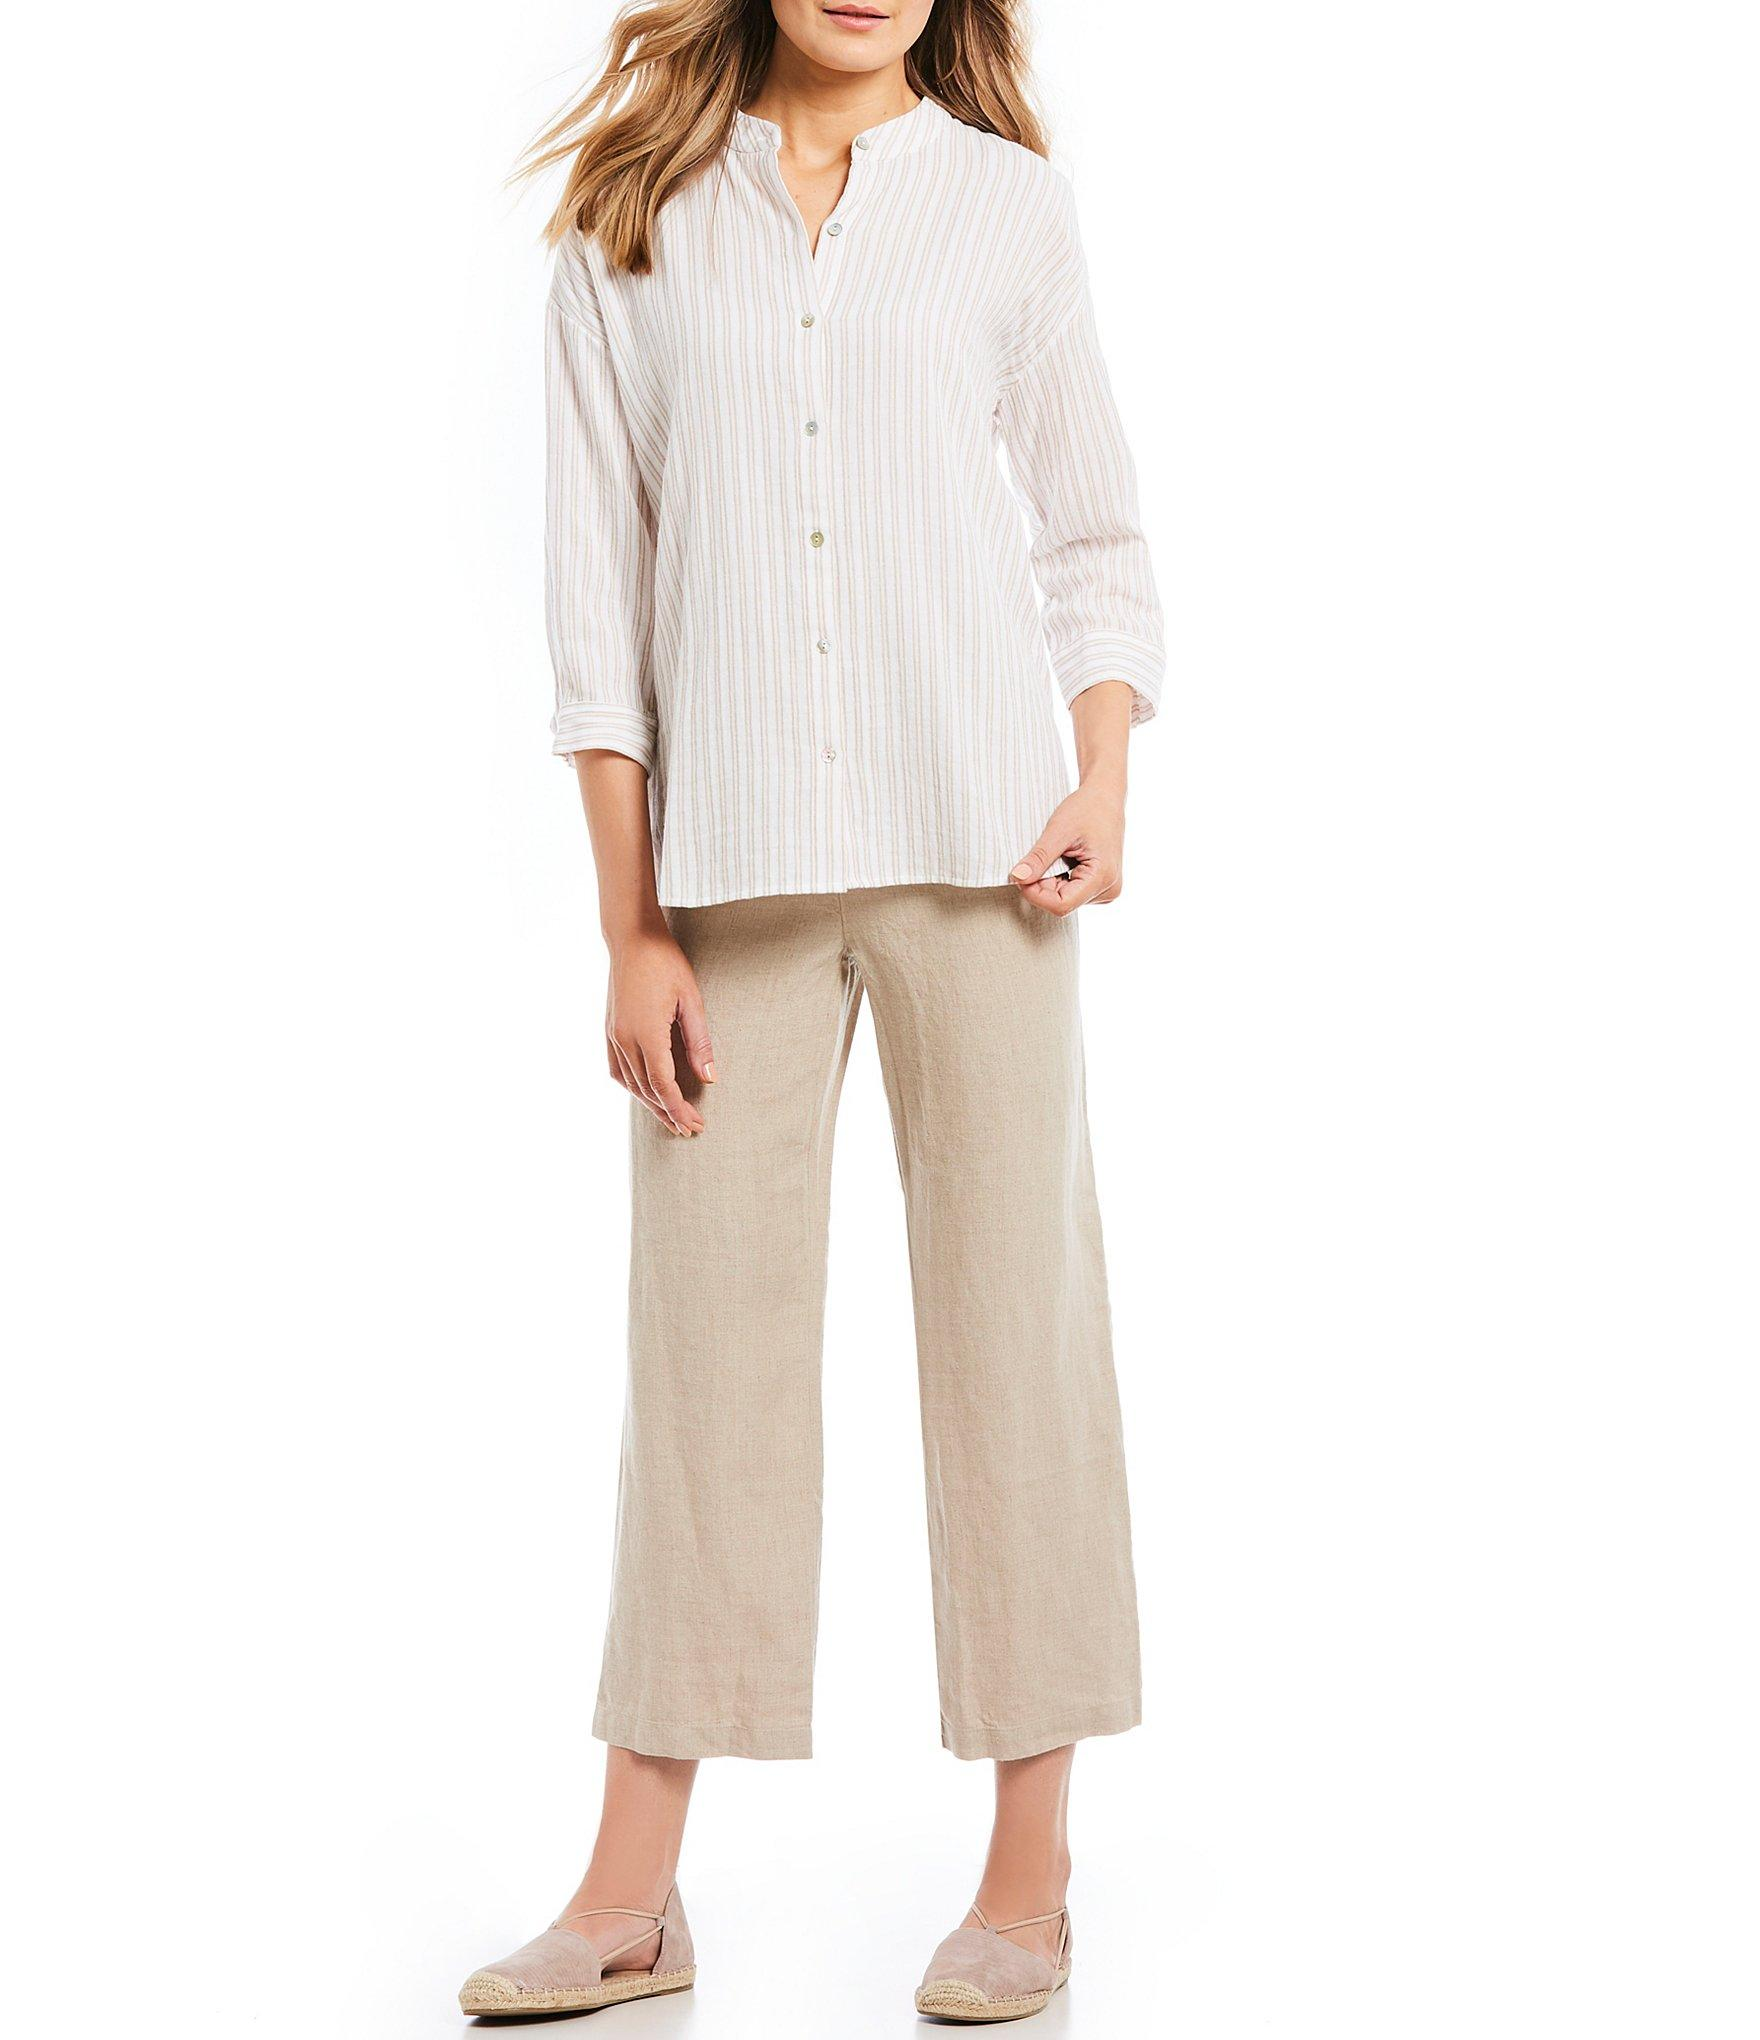 c53e5aab179 Eileen Fisher - Multicolor Mandarin Collar Striped Boxy Button Front Shirt  - Lyst. View fullscreen